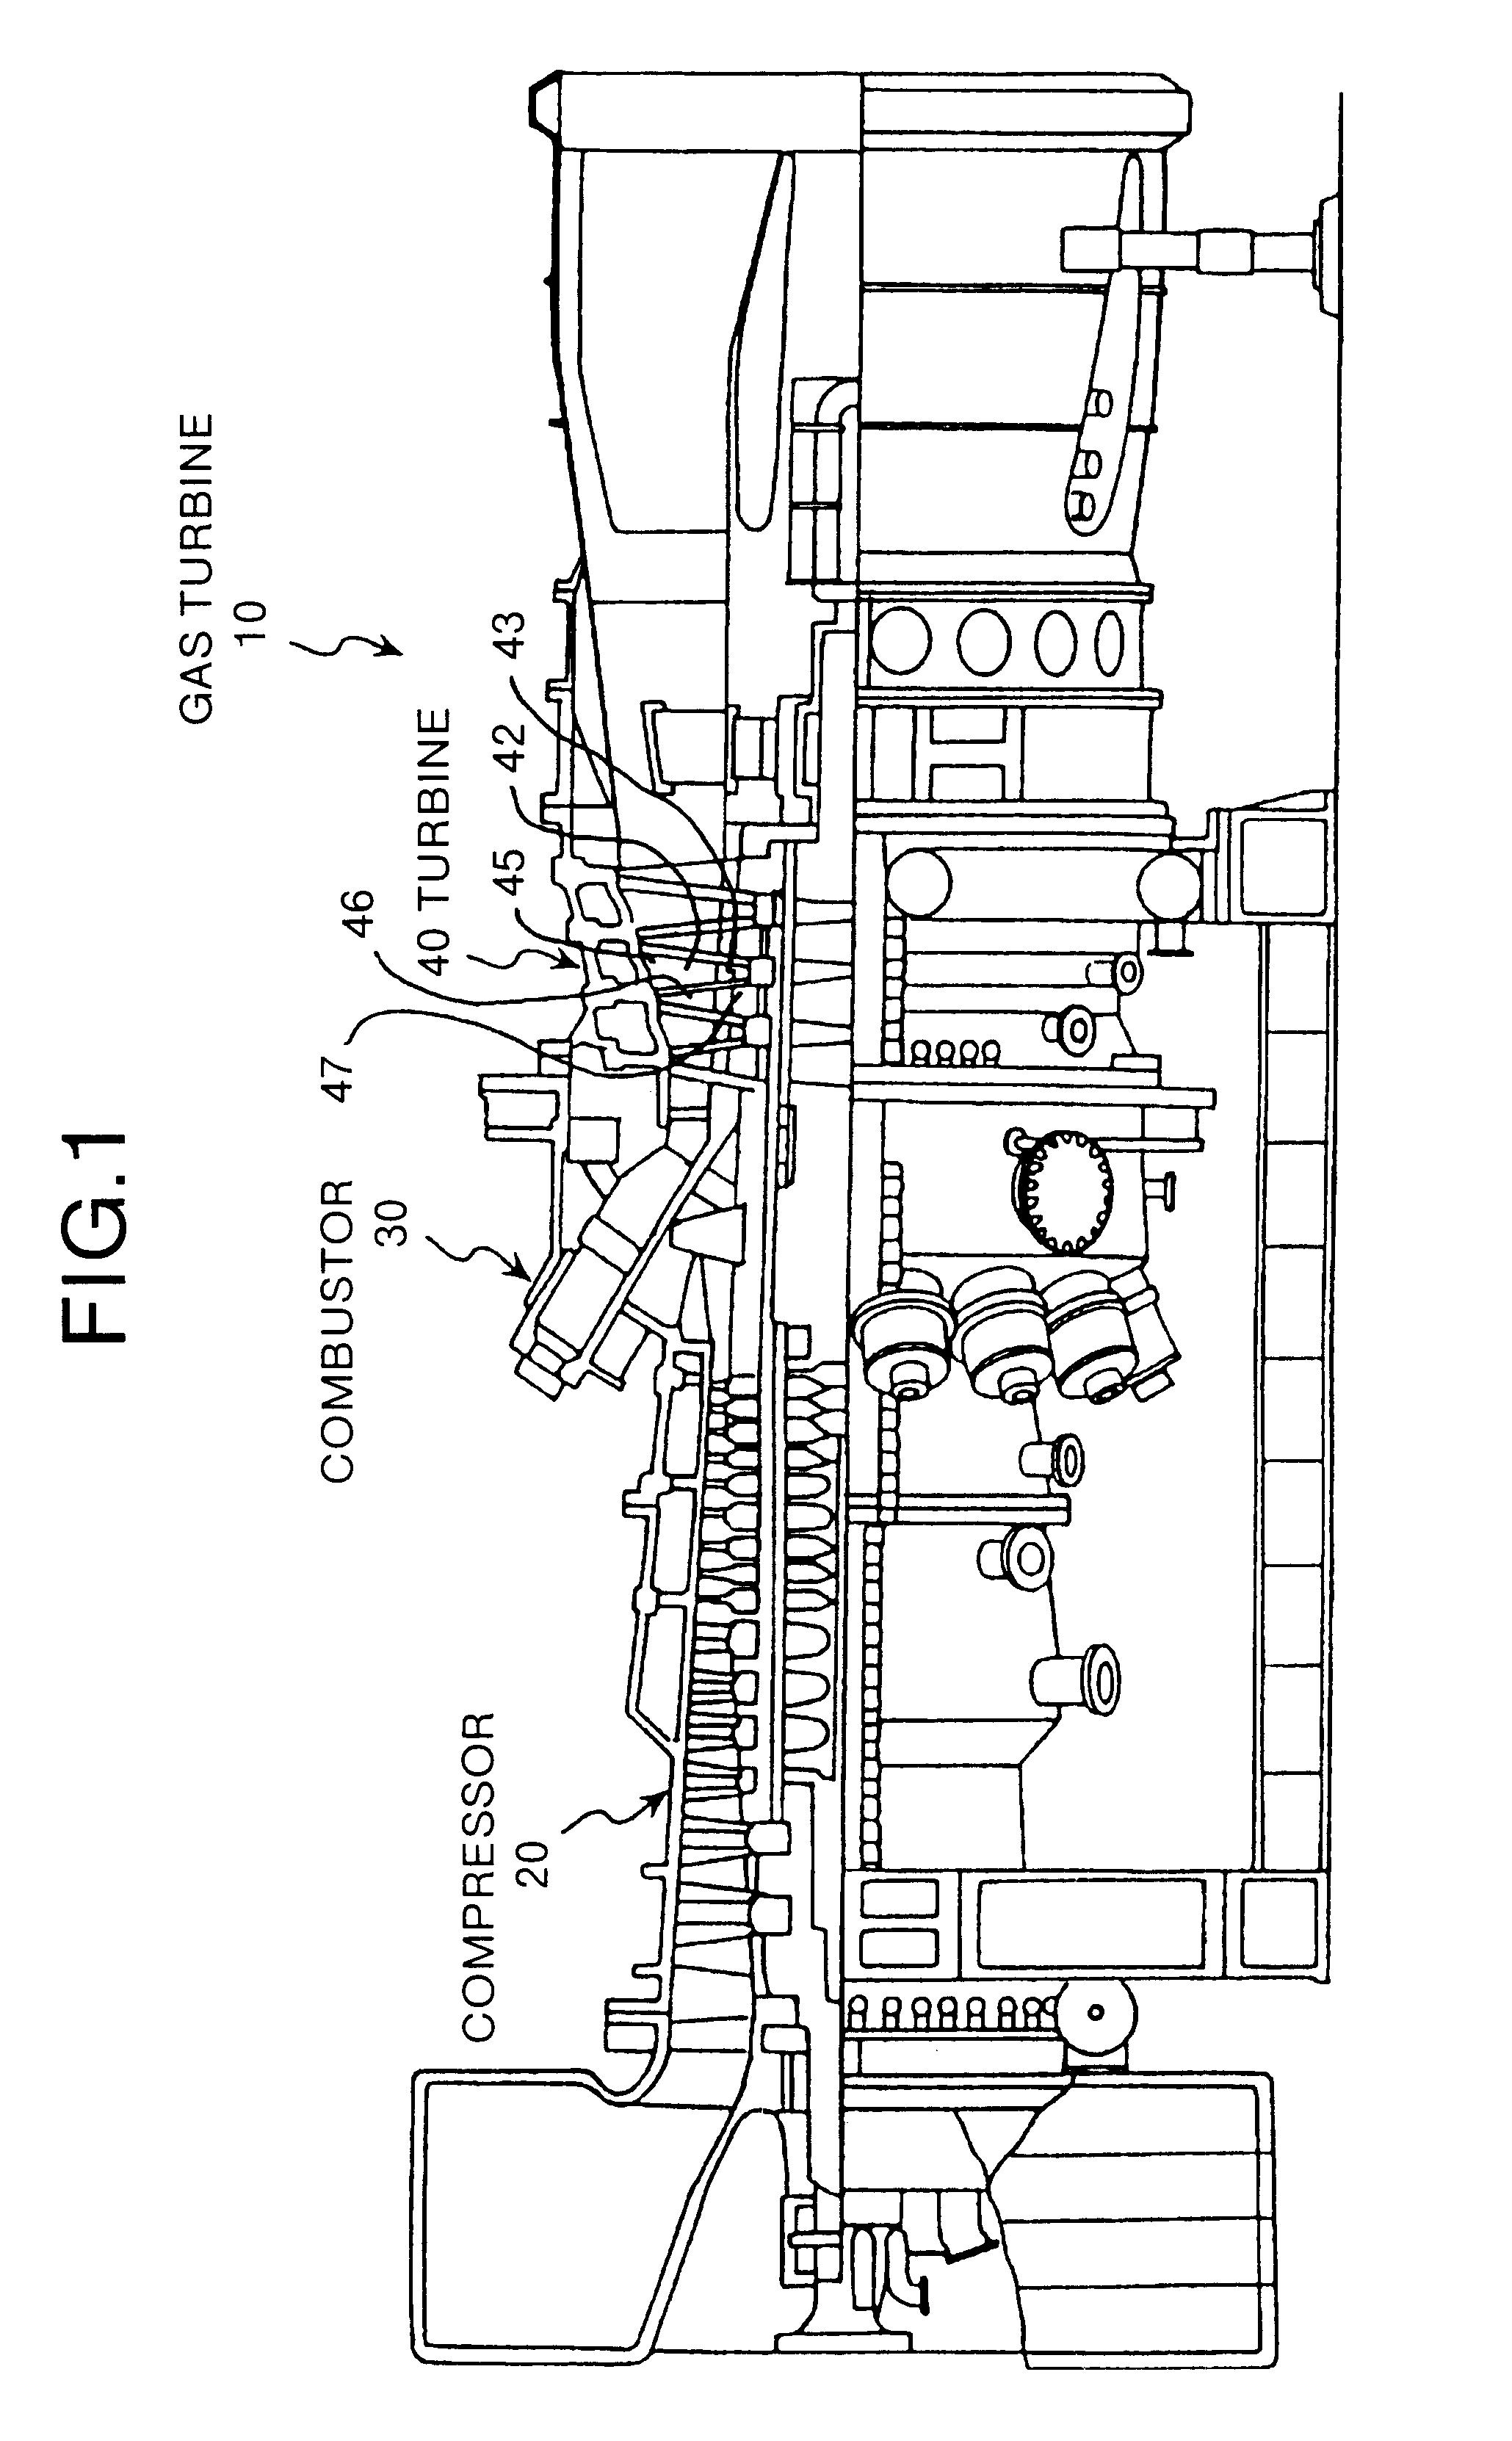 Patent US Stationary blade shroud of a gas turbine